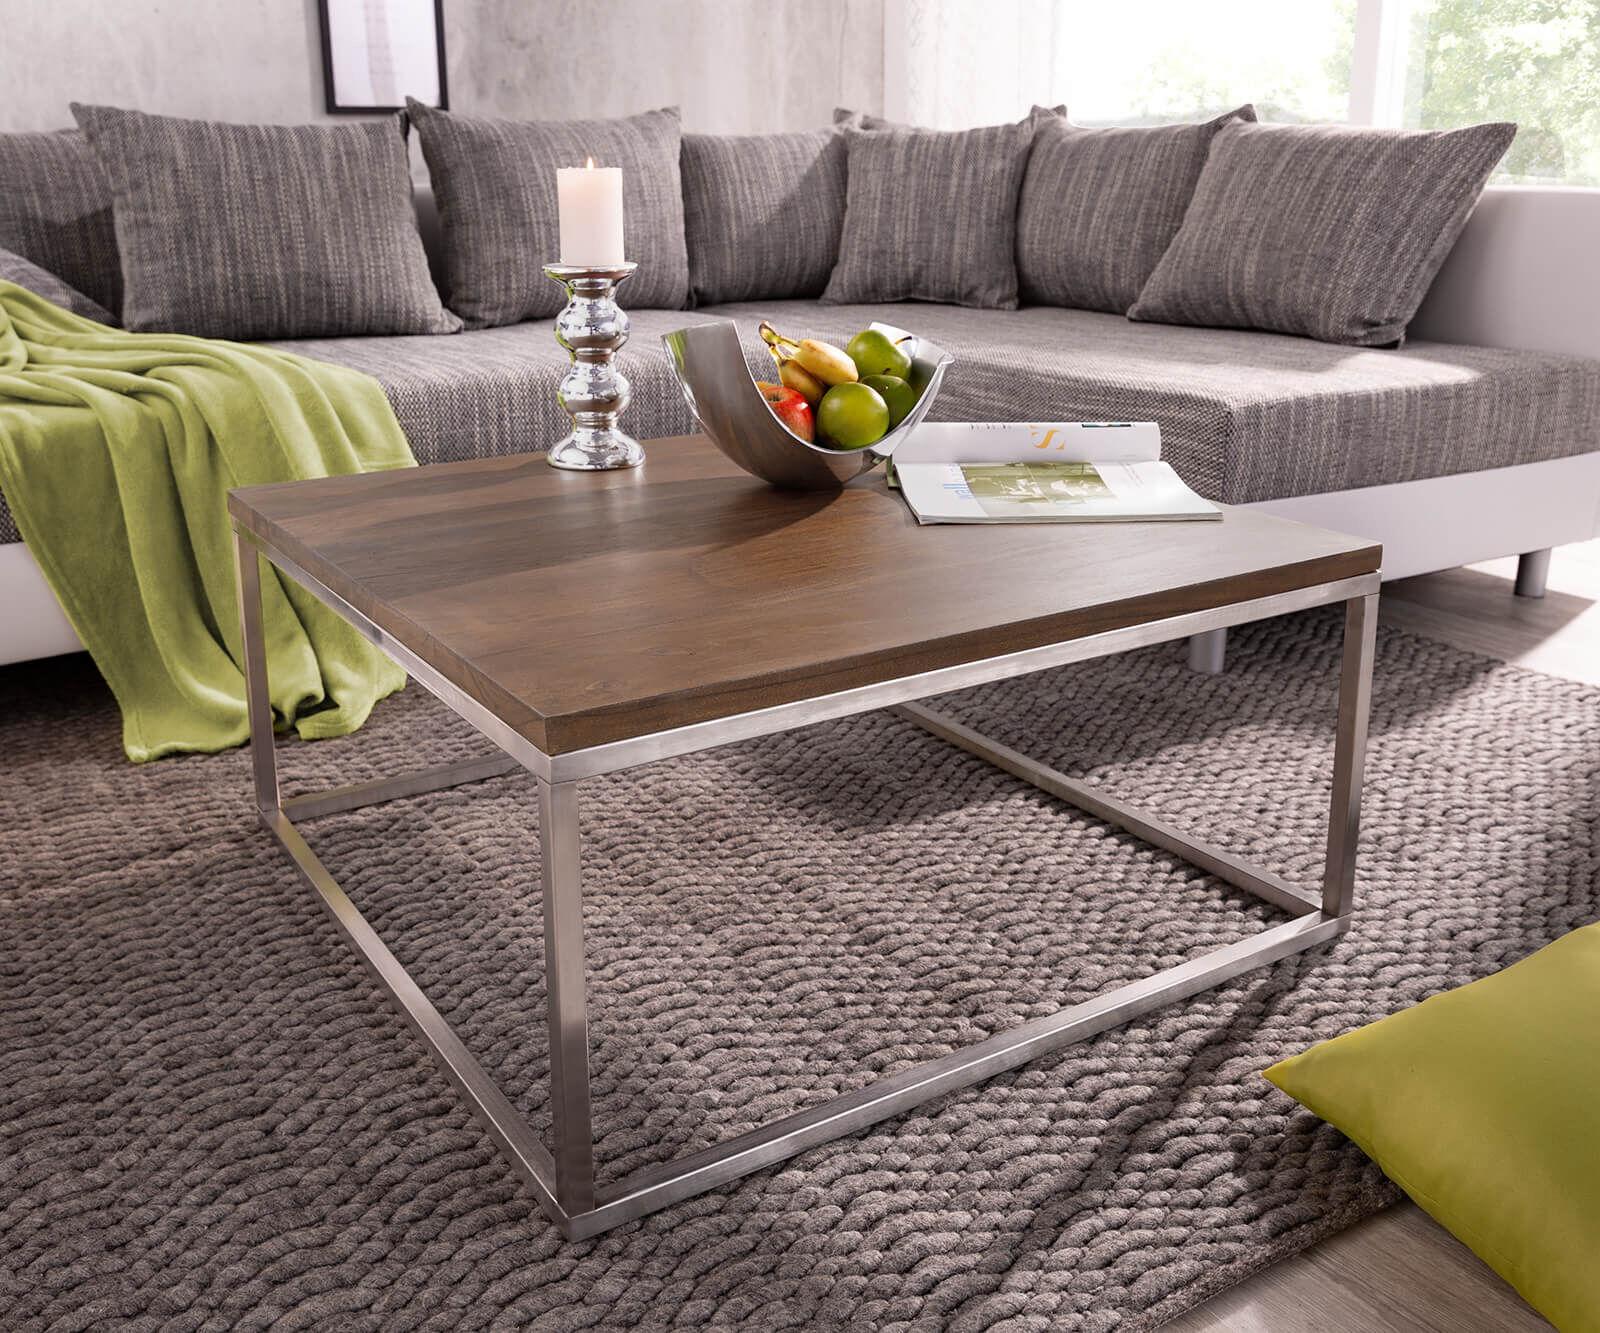 DELIFE Table basse Tatius 80x80cm cadre acacia brun acier inoxydable